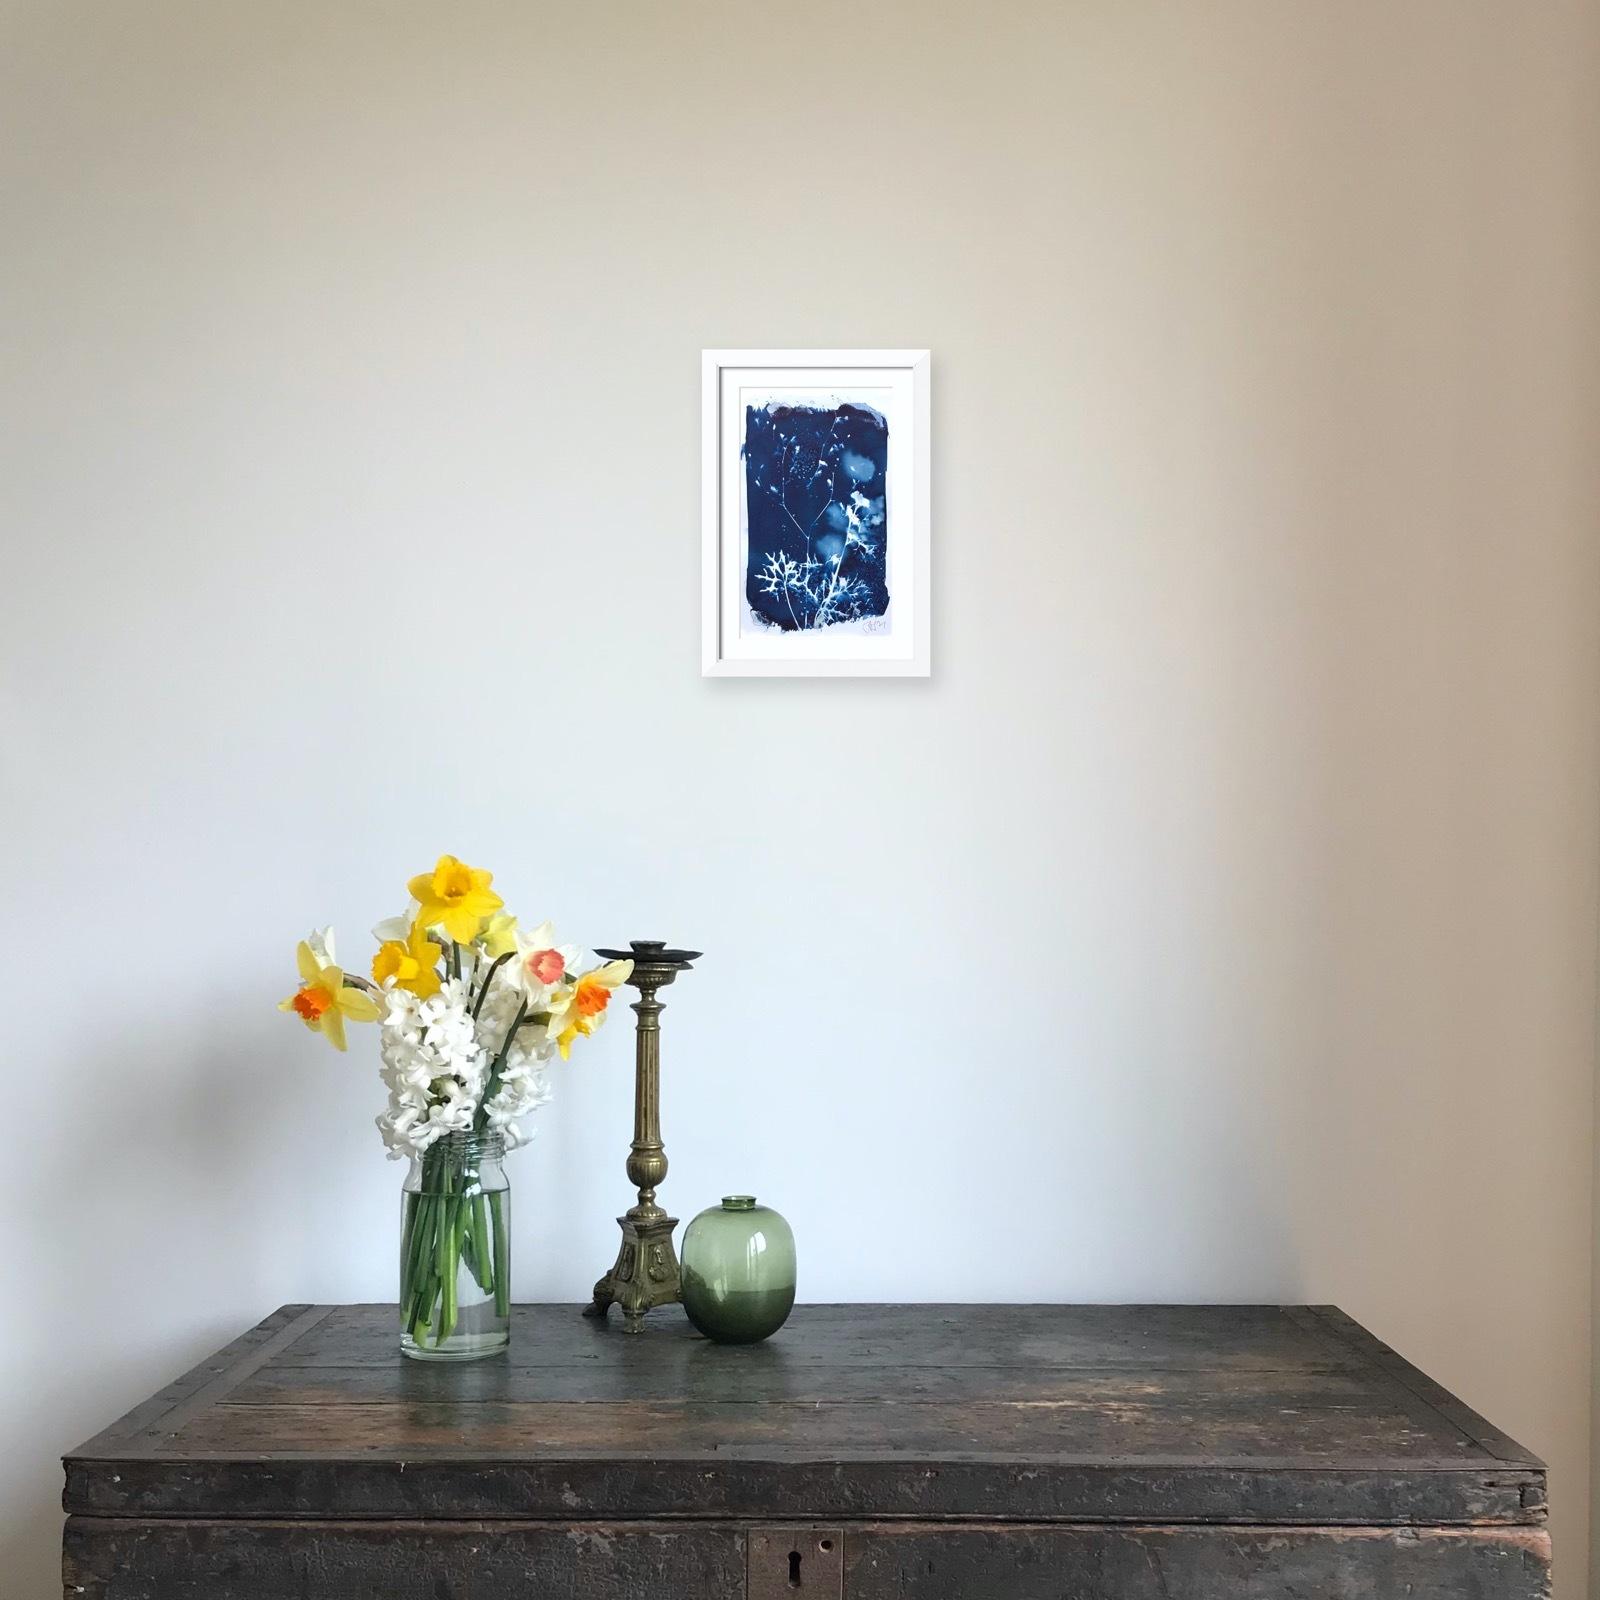 Cyanotype with meadow flowers 6